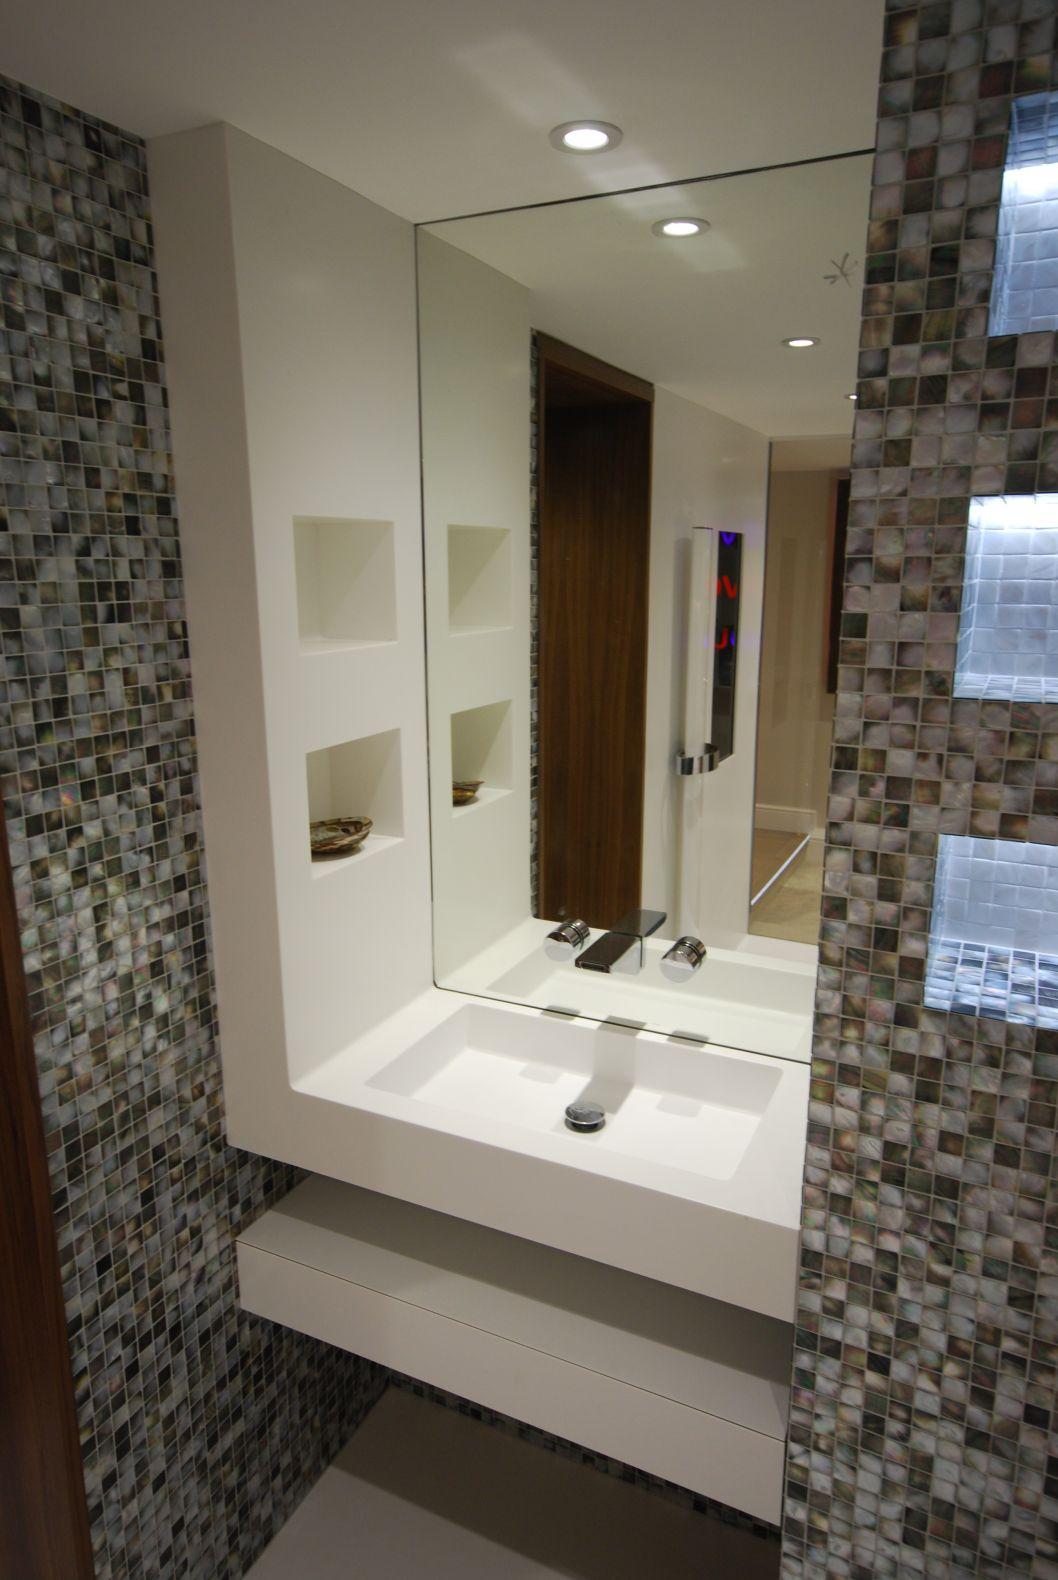 Wall Panels Solidity - Public bathroom wall panels